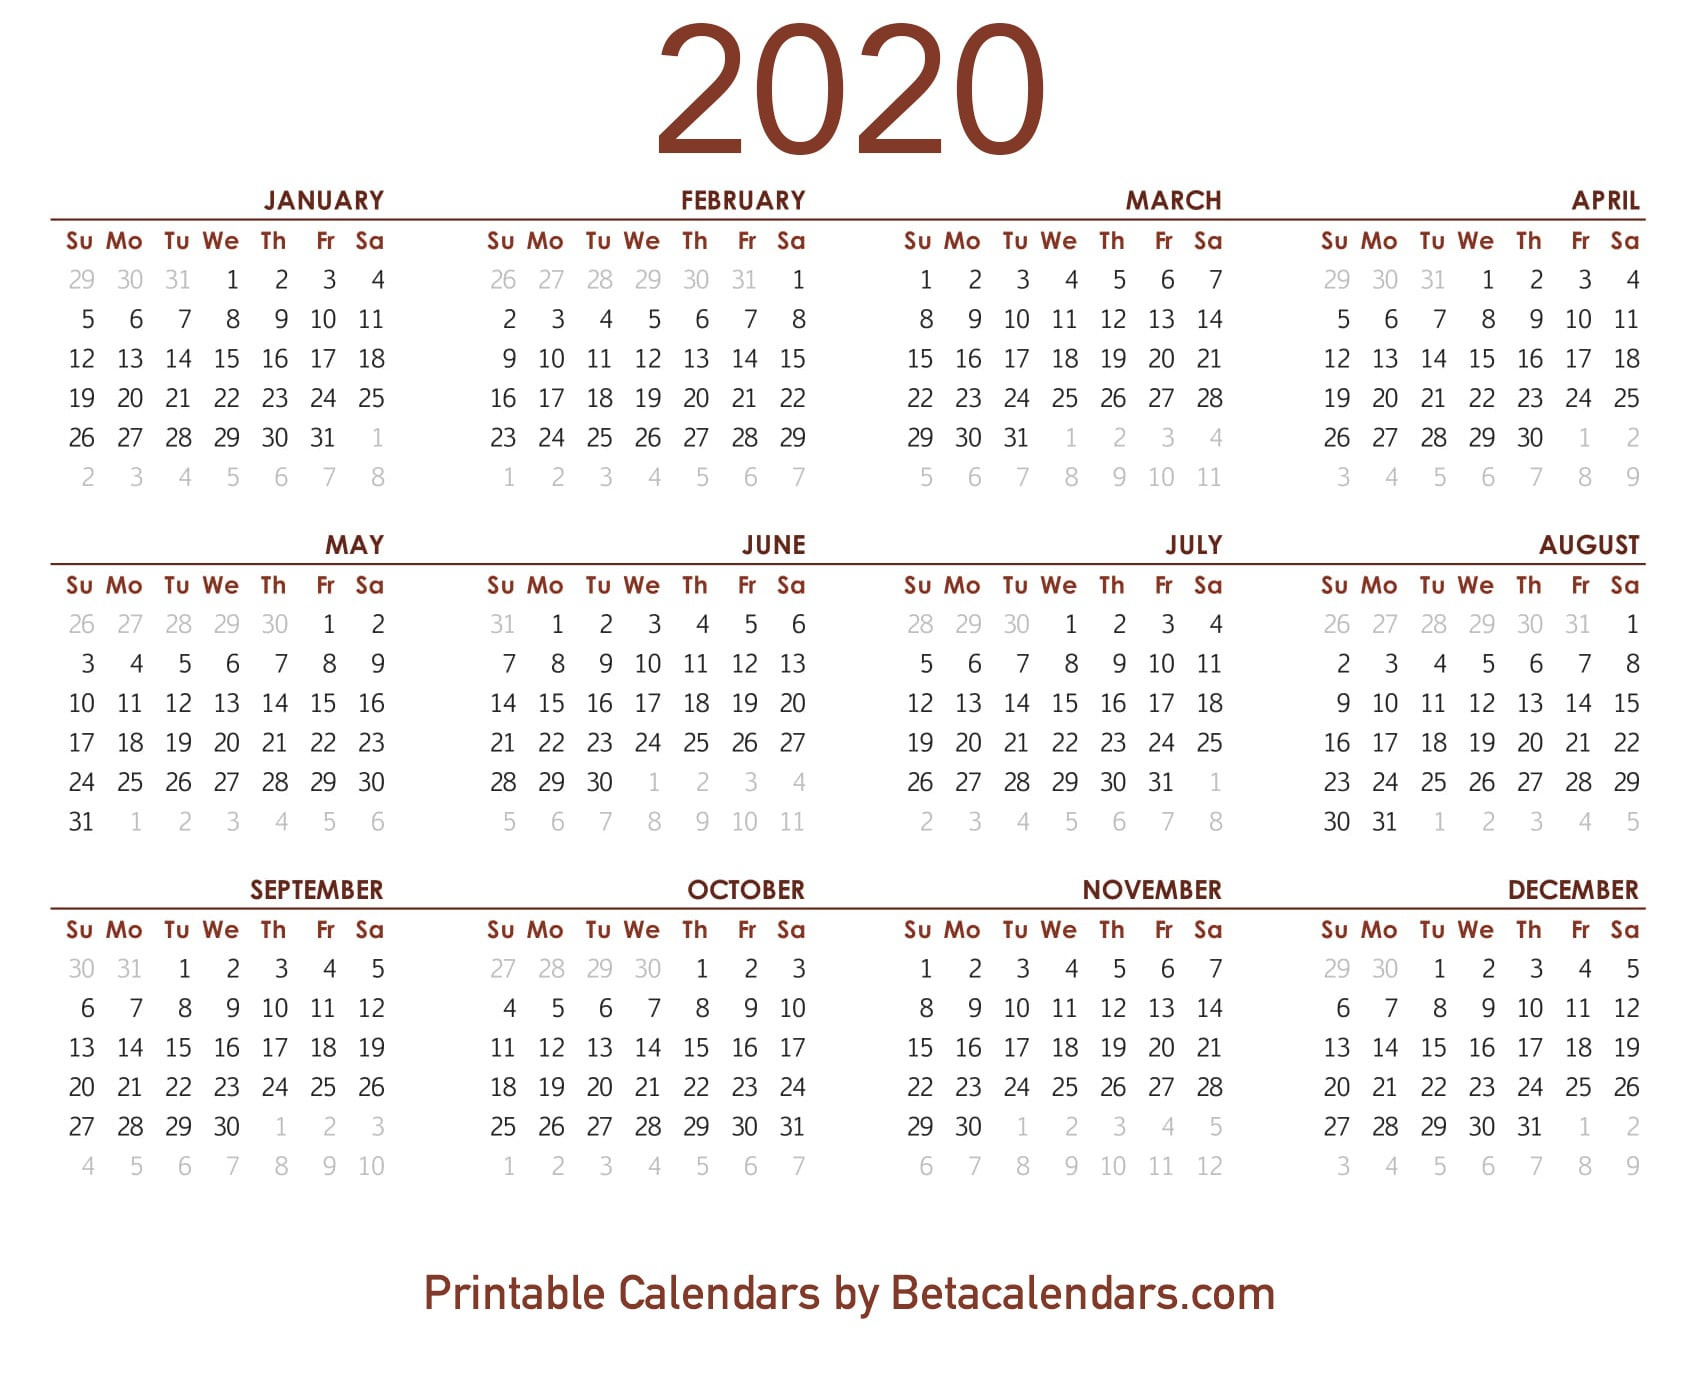 2020 Calendar - Free Printable Yearly Calendar 2020 regarding Yearly Printable Calendar 2020